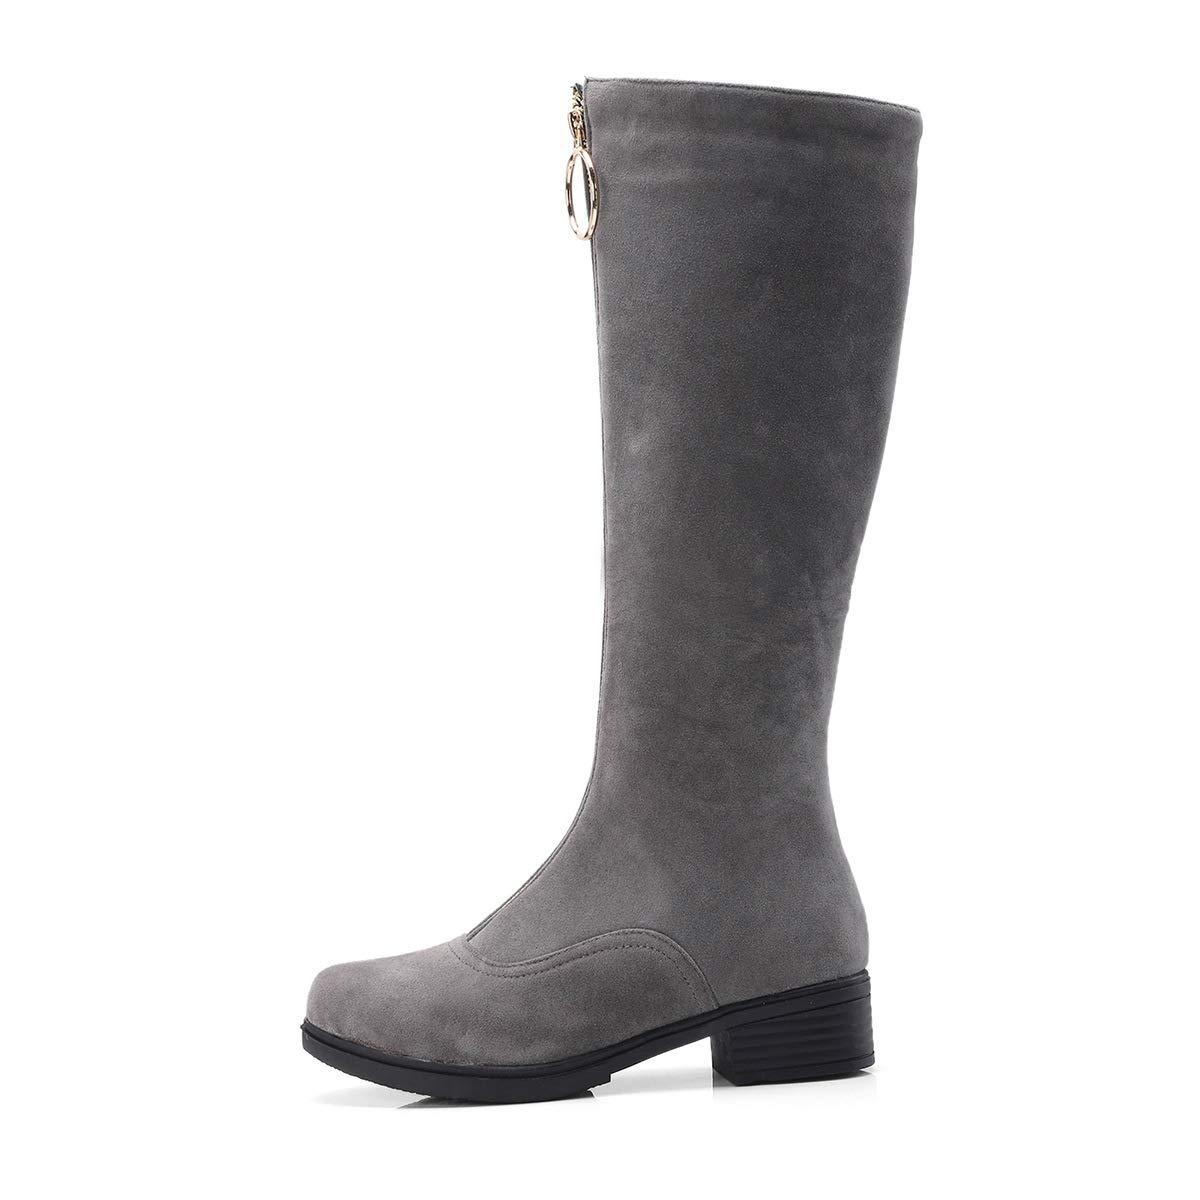 Frauen Runde Zehe niedrige Ferse Lange Stiefel Schuhe